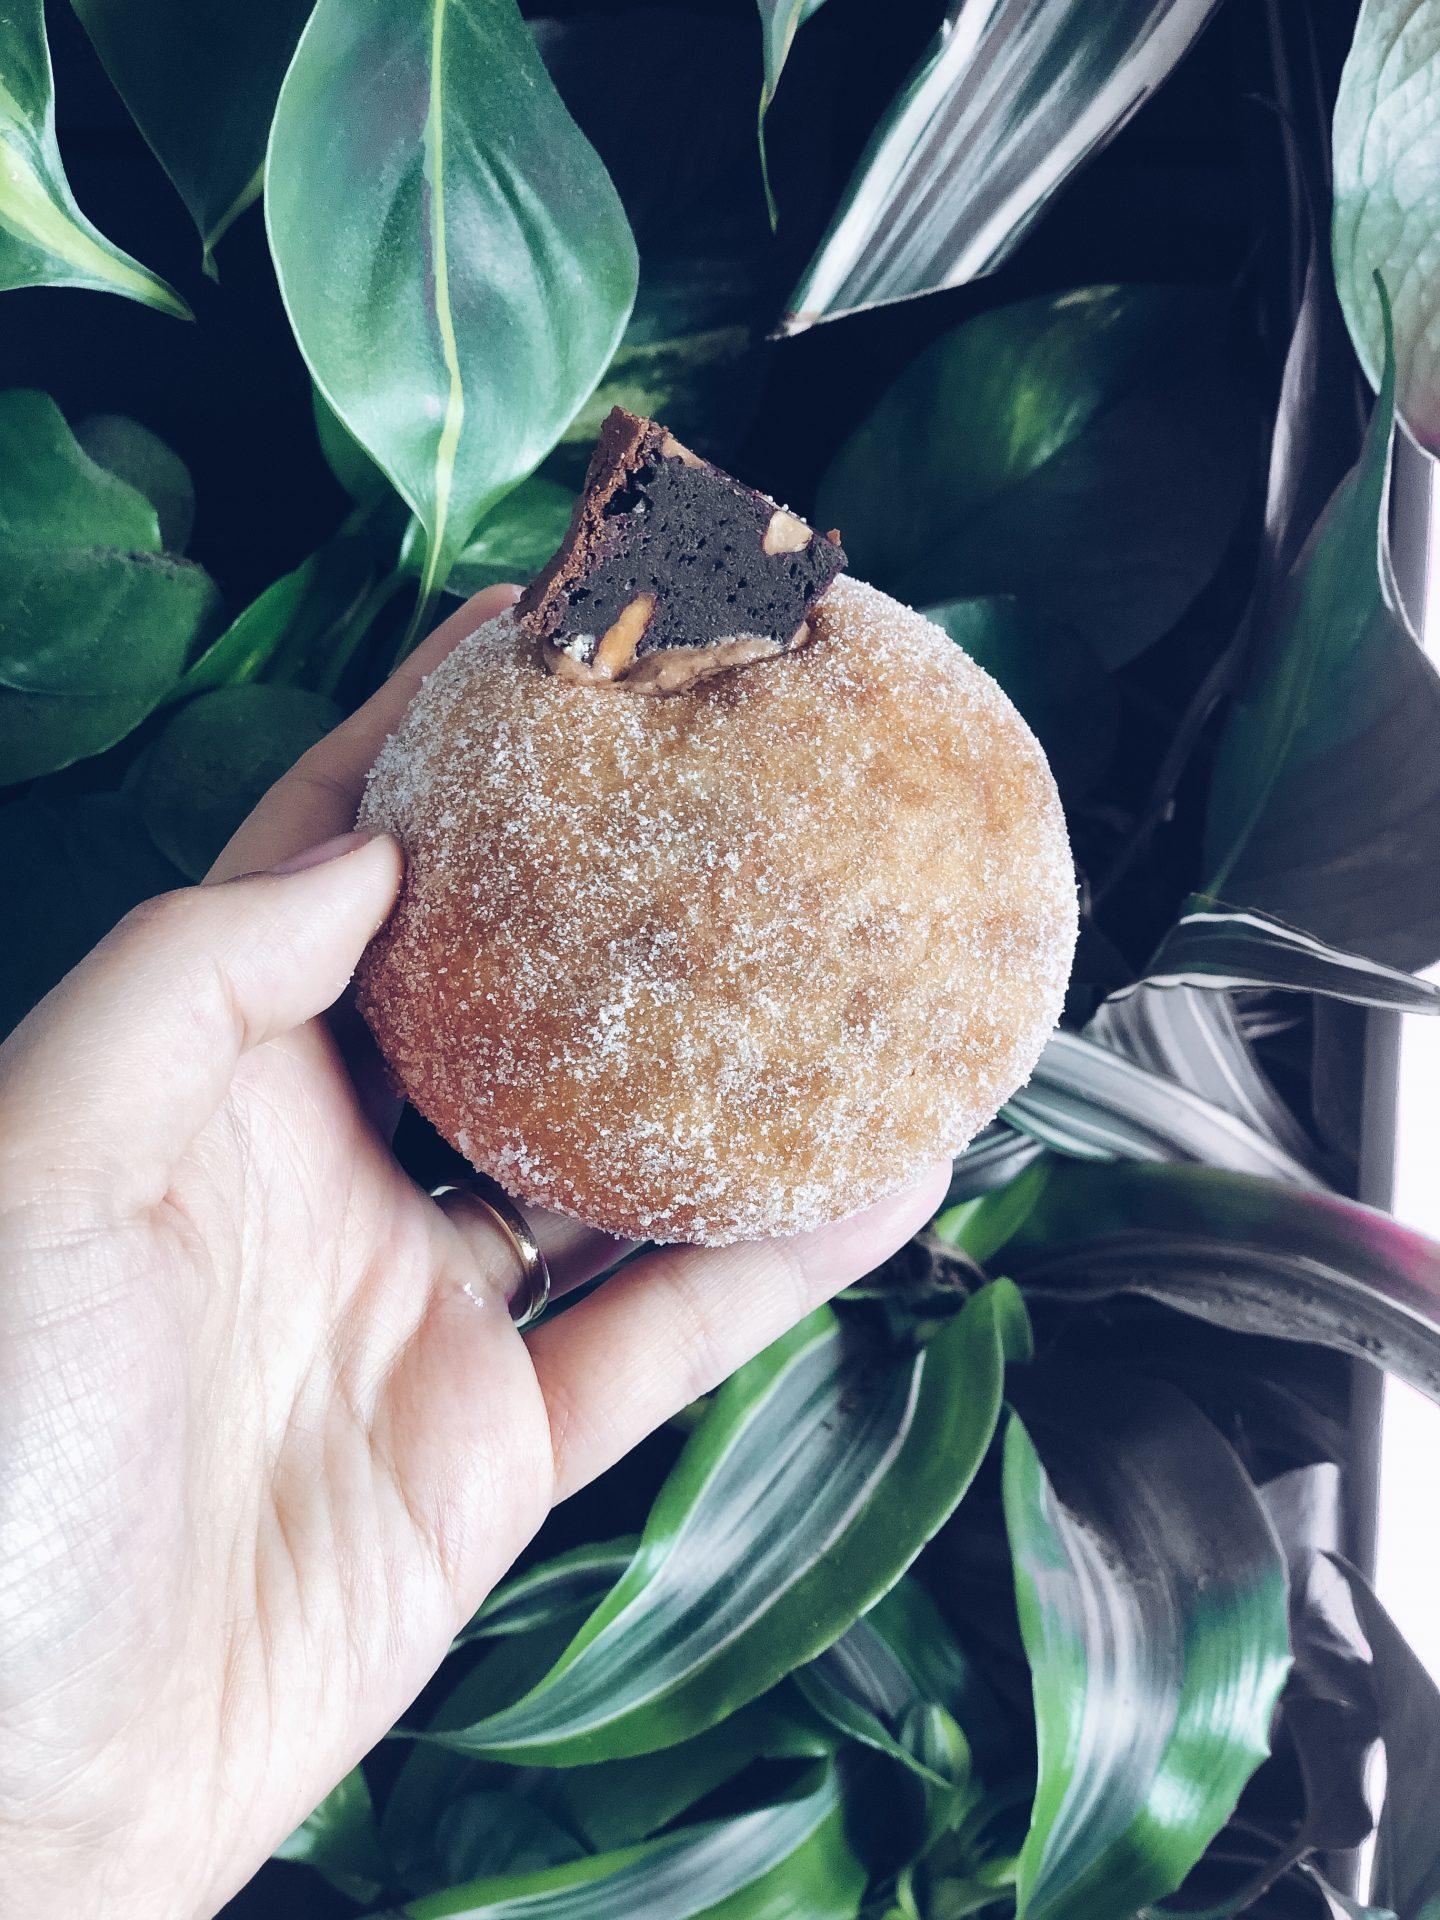 chocolate pecan brownie sourdoughnut from pinkman's bakery in bristol